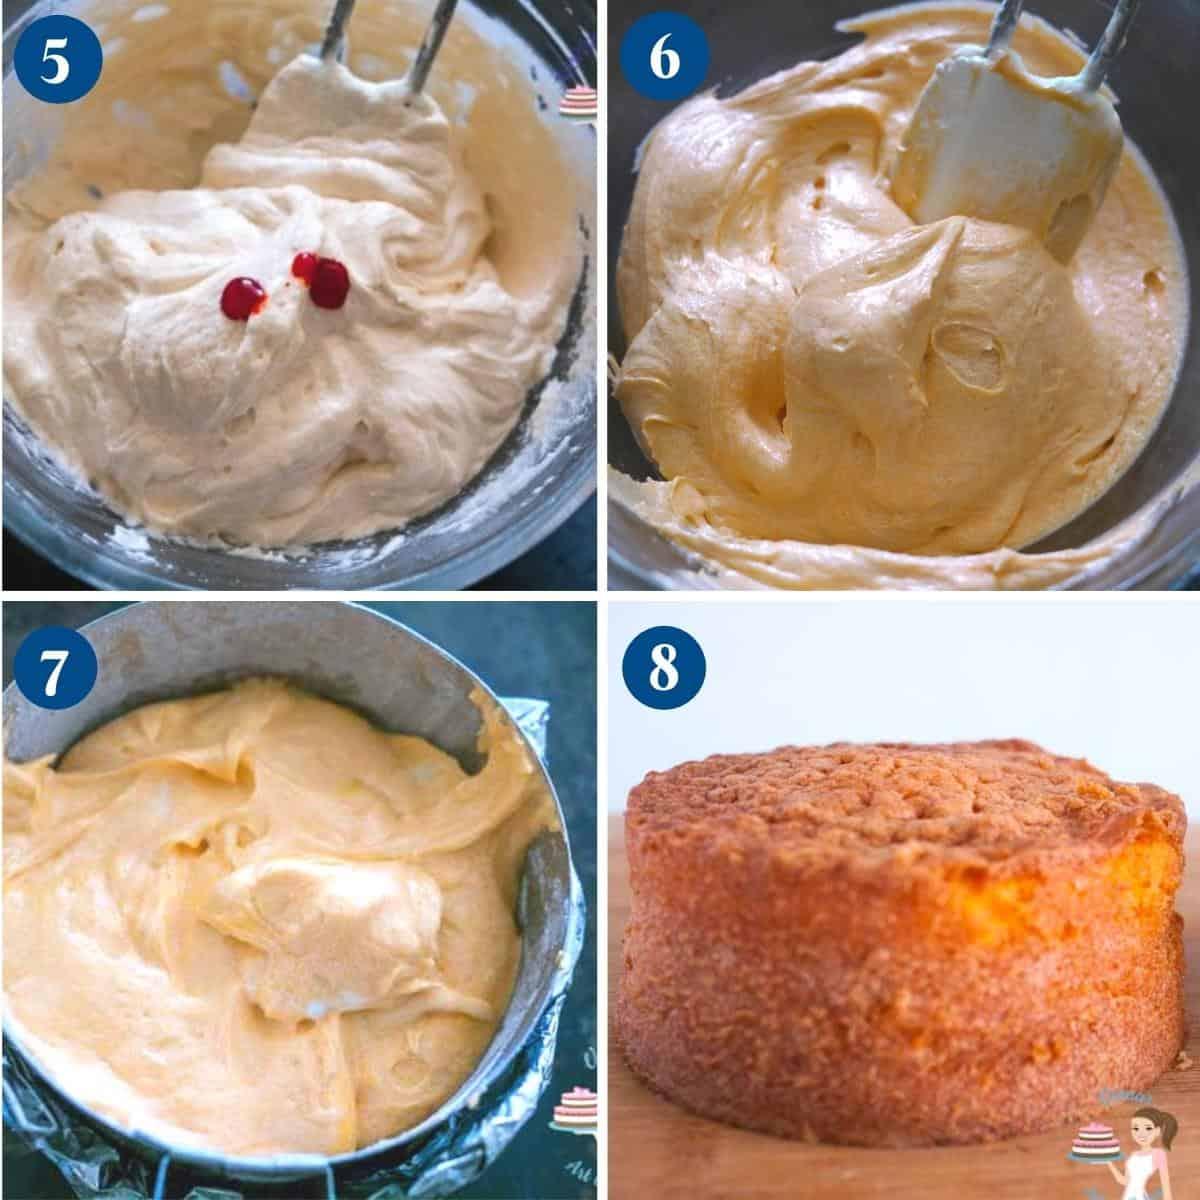 Progress pictures collage making orange layer cake batter.